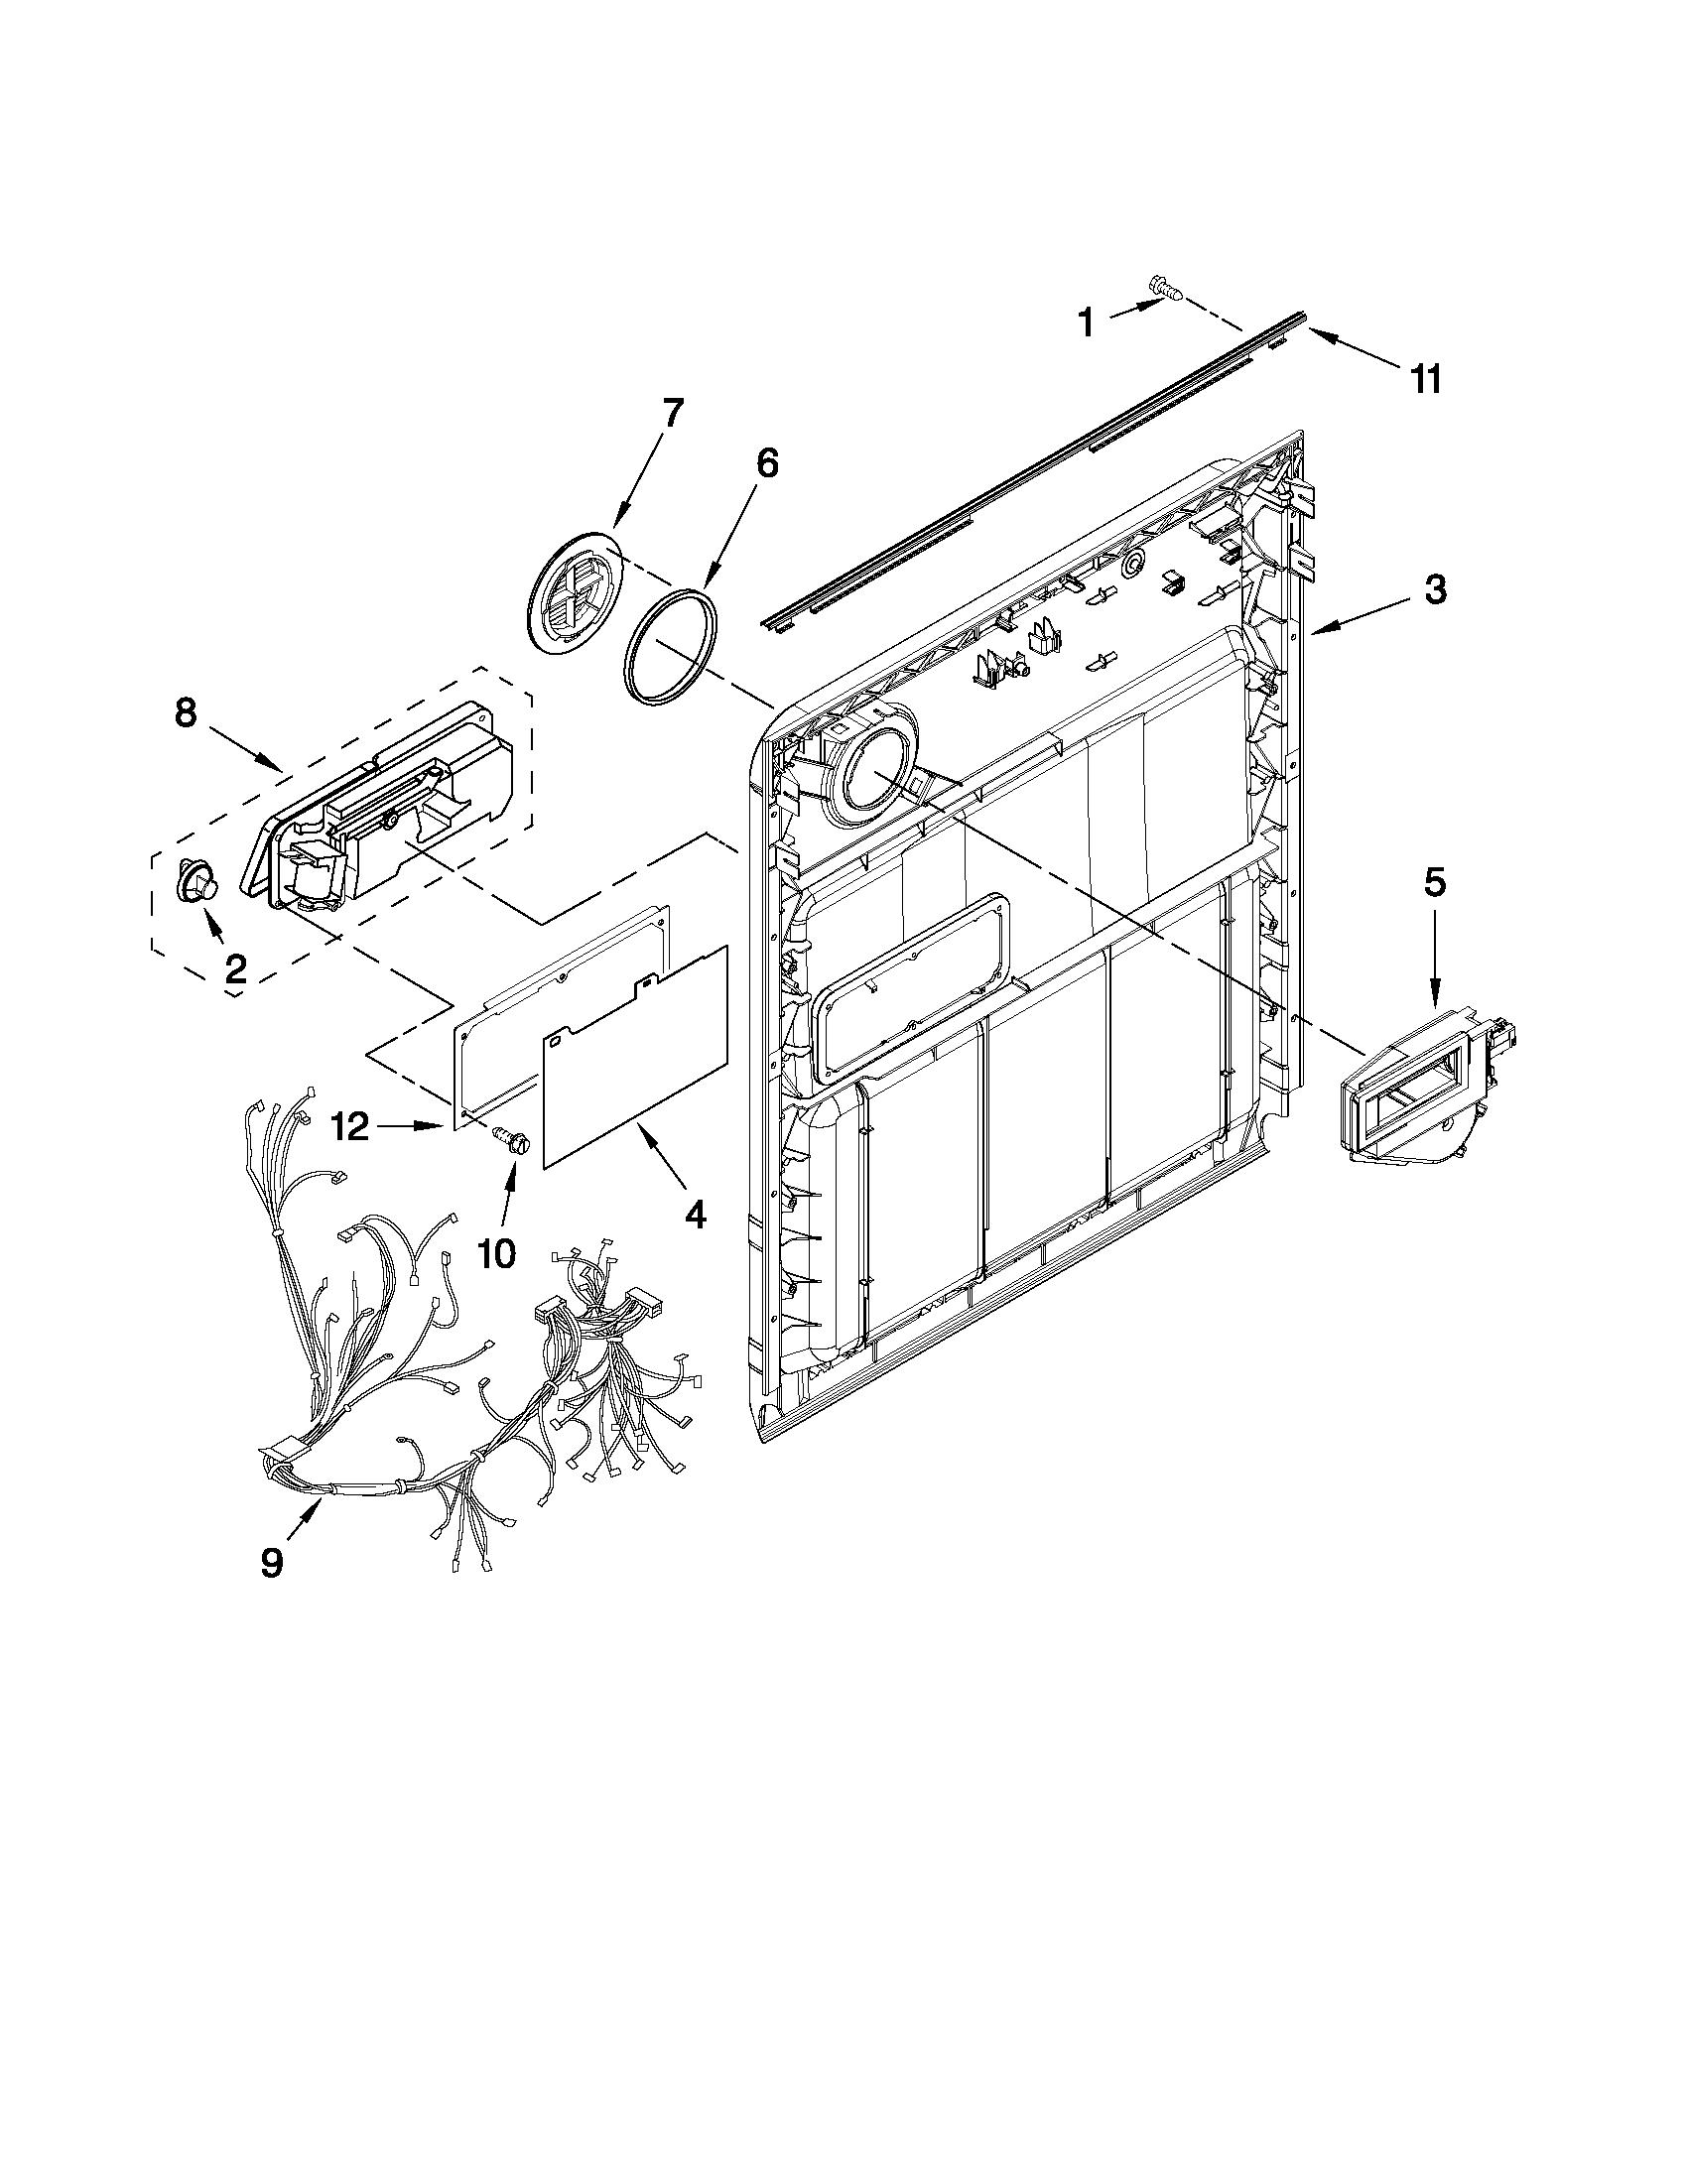 Whirlpool model WDF530PAYW3 dishwasher genuine parts